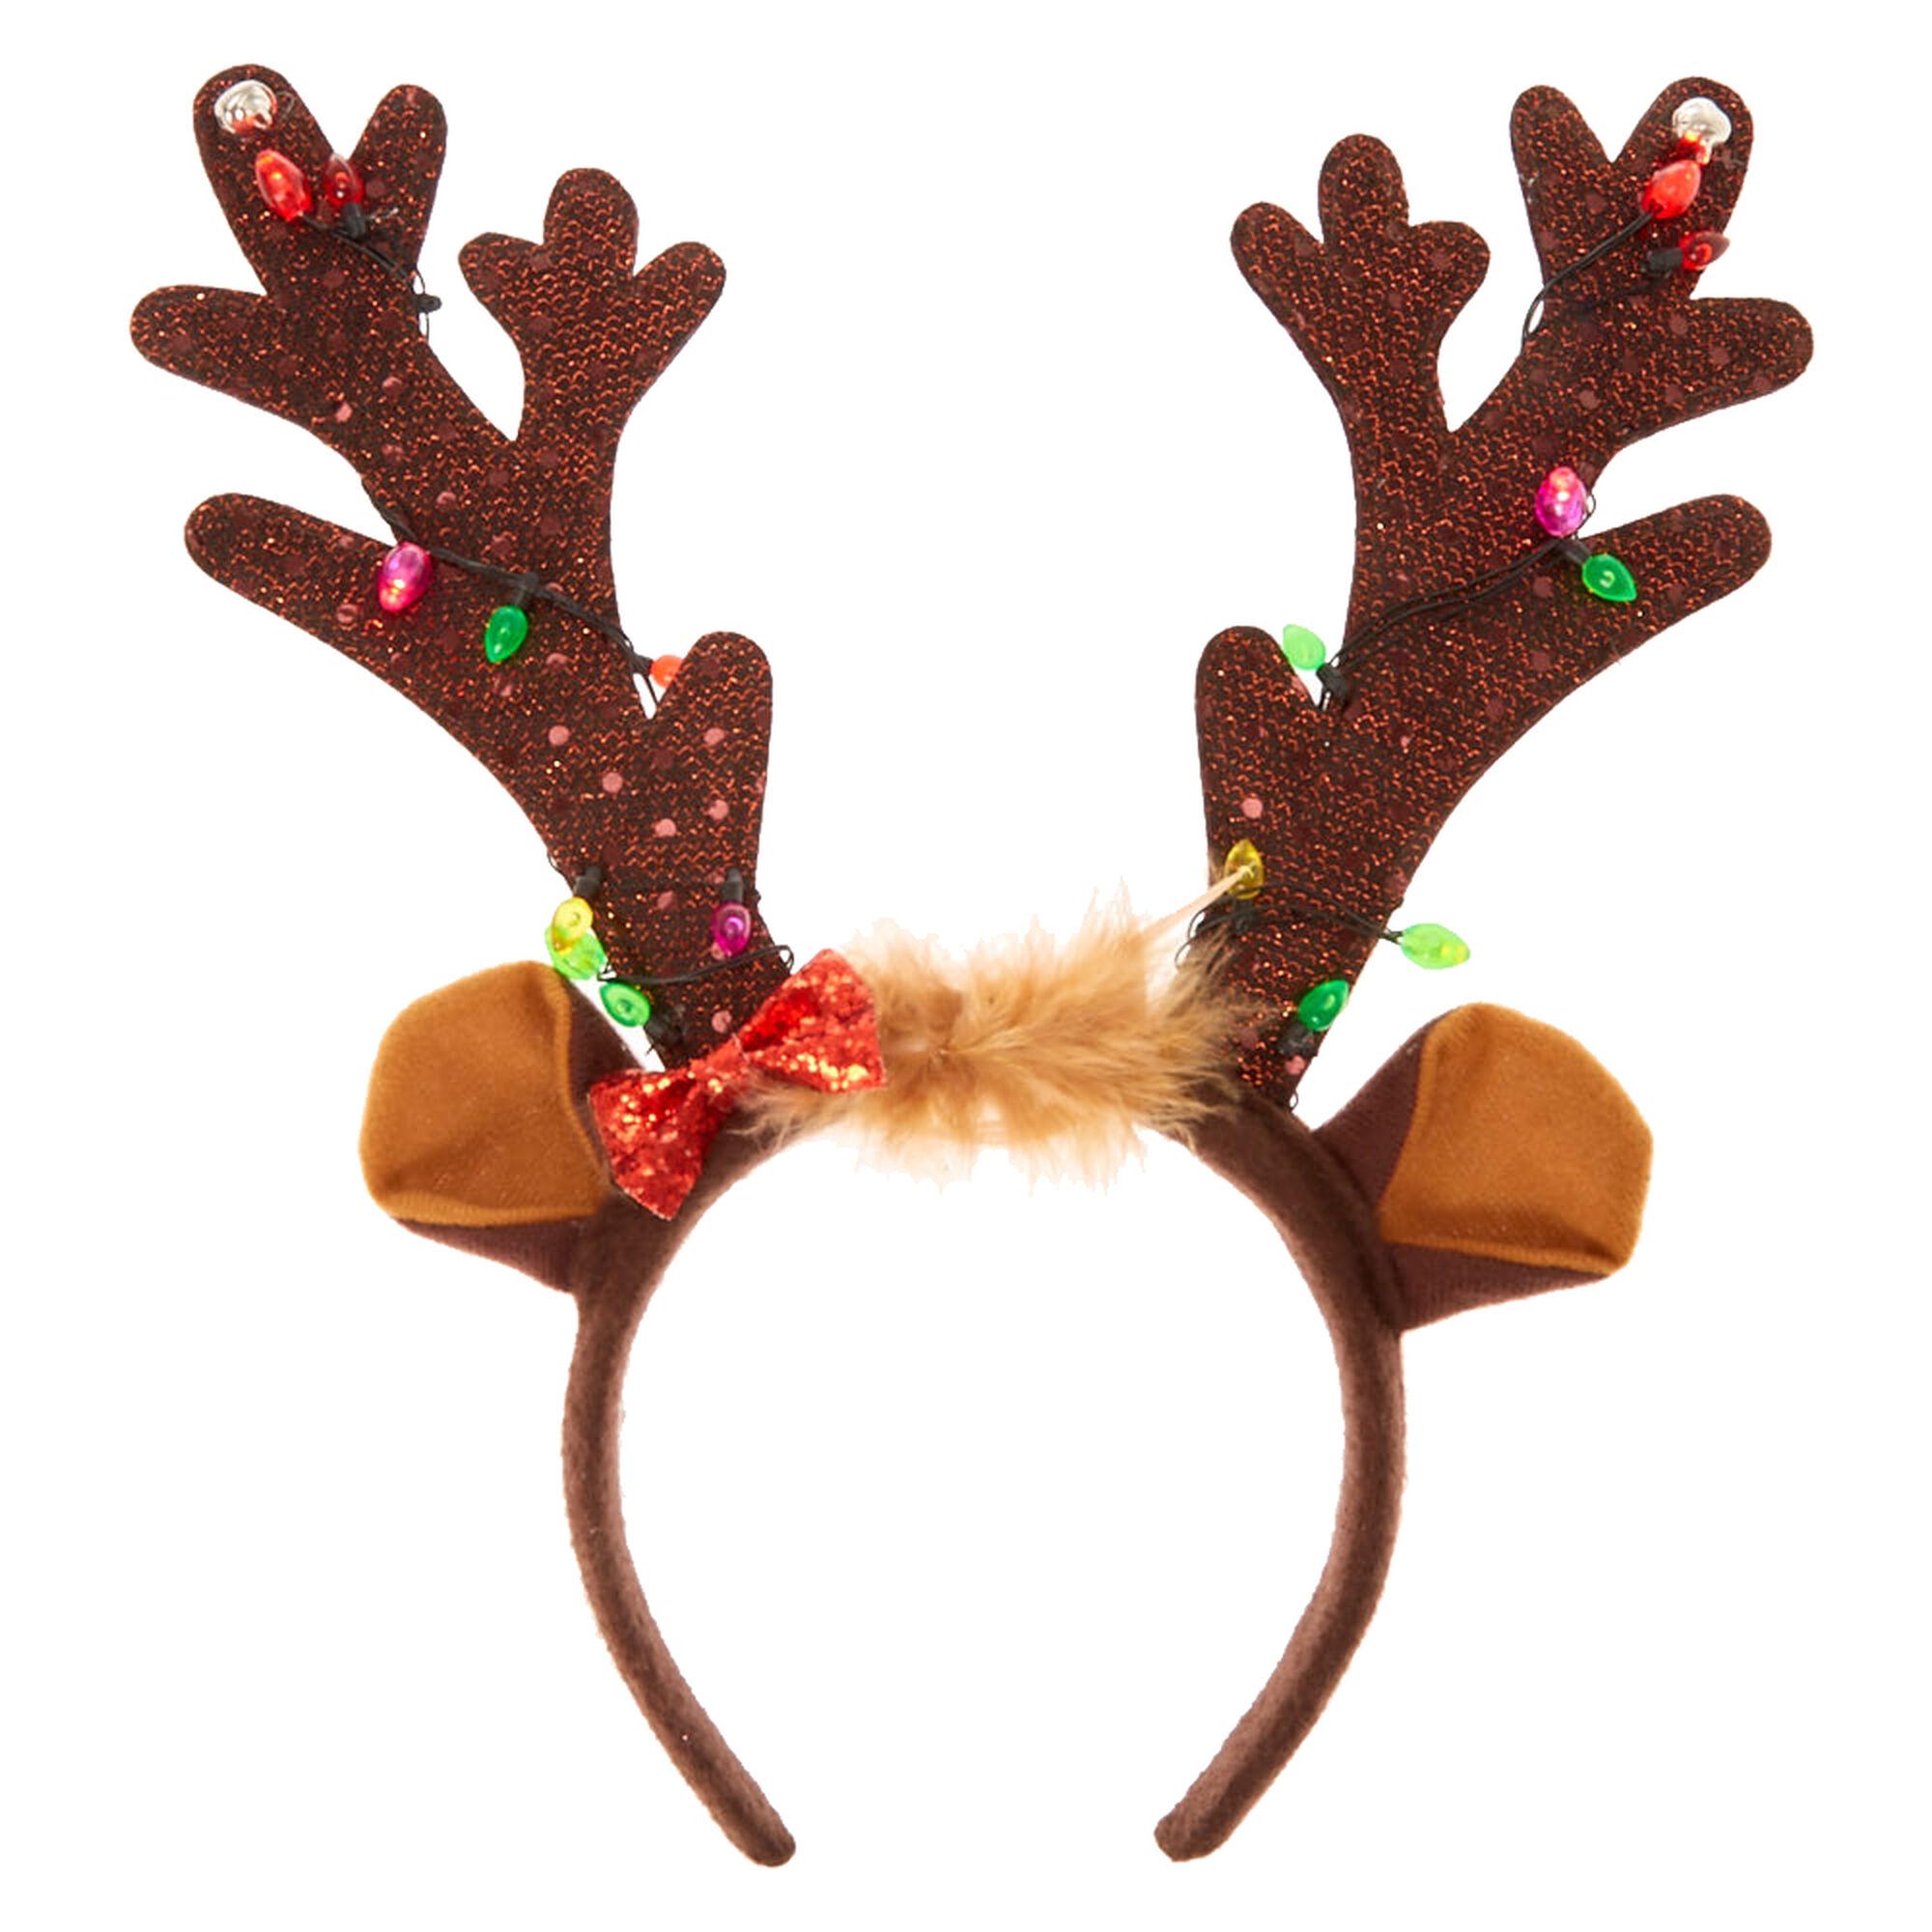 Image result for reindeer antlers